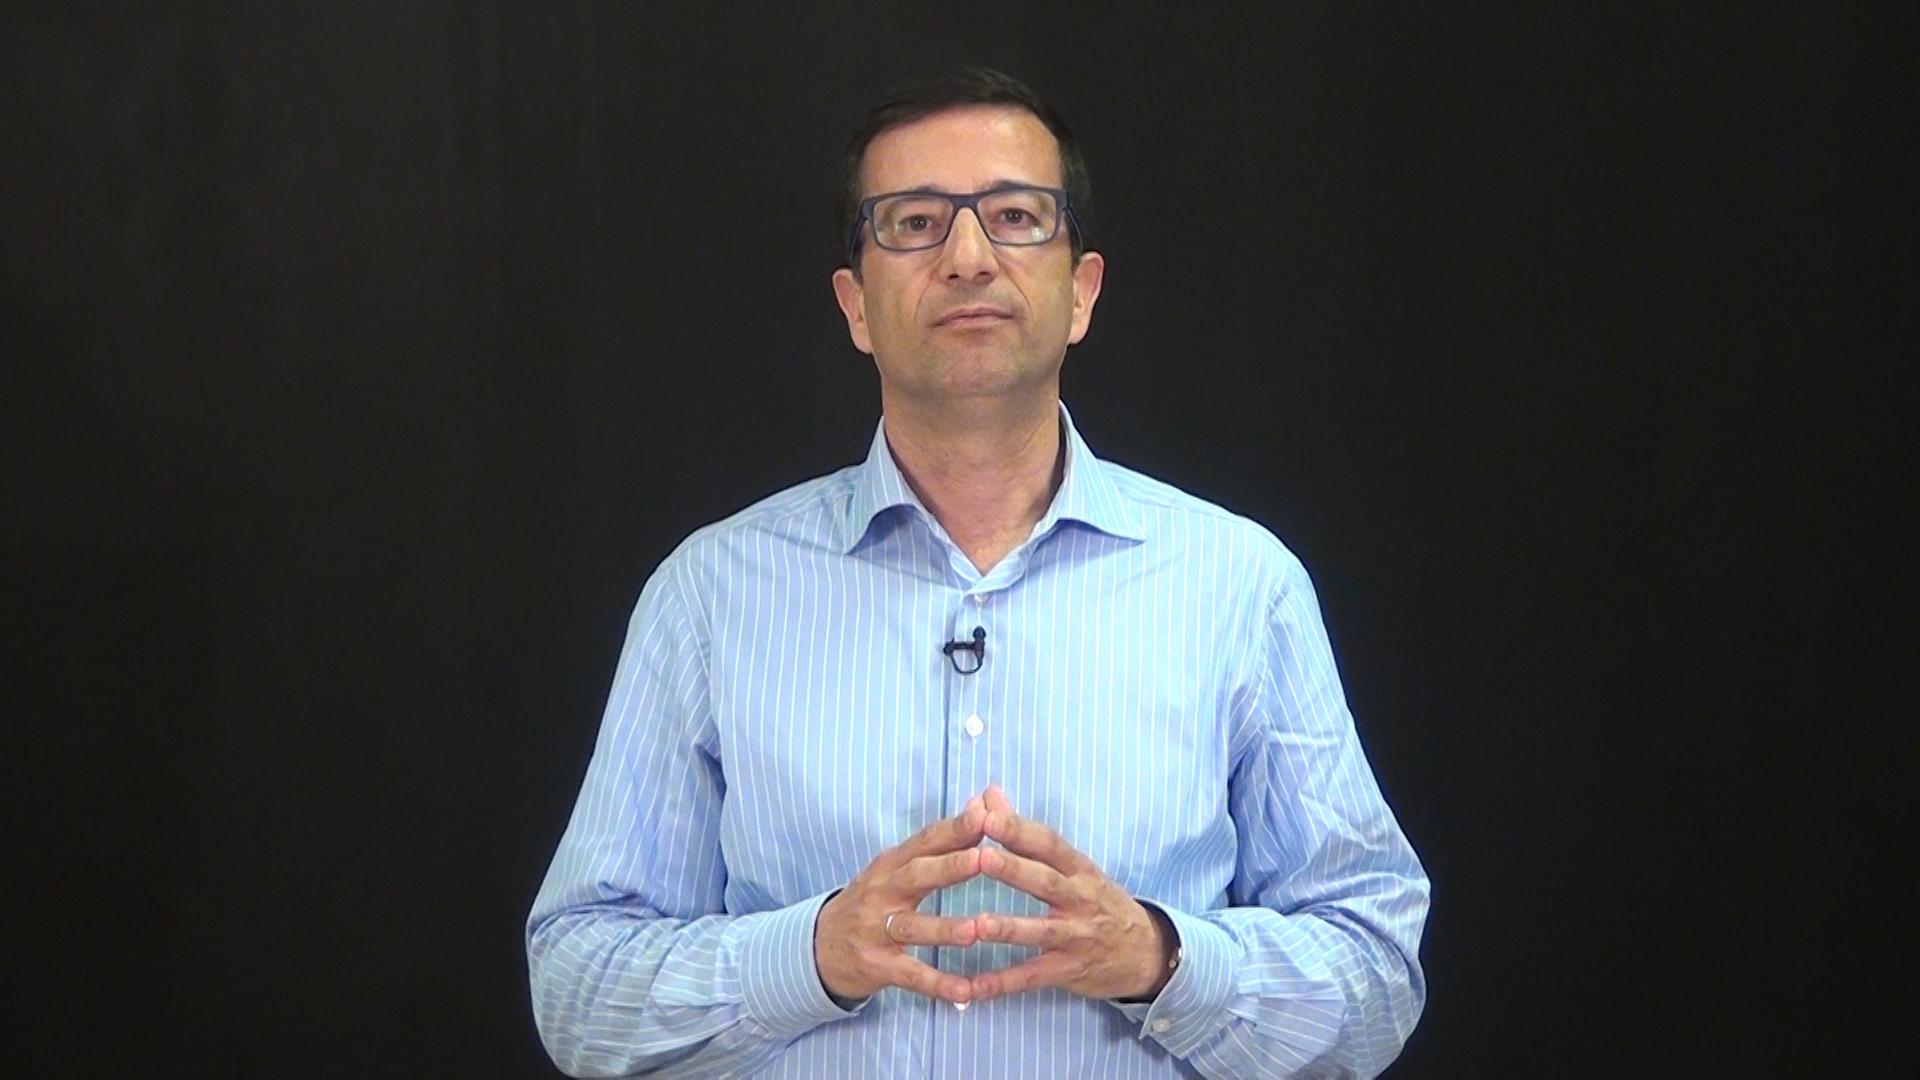 José Alberto García Avilés